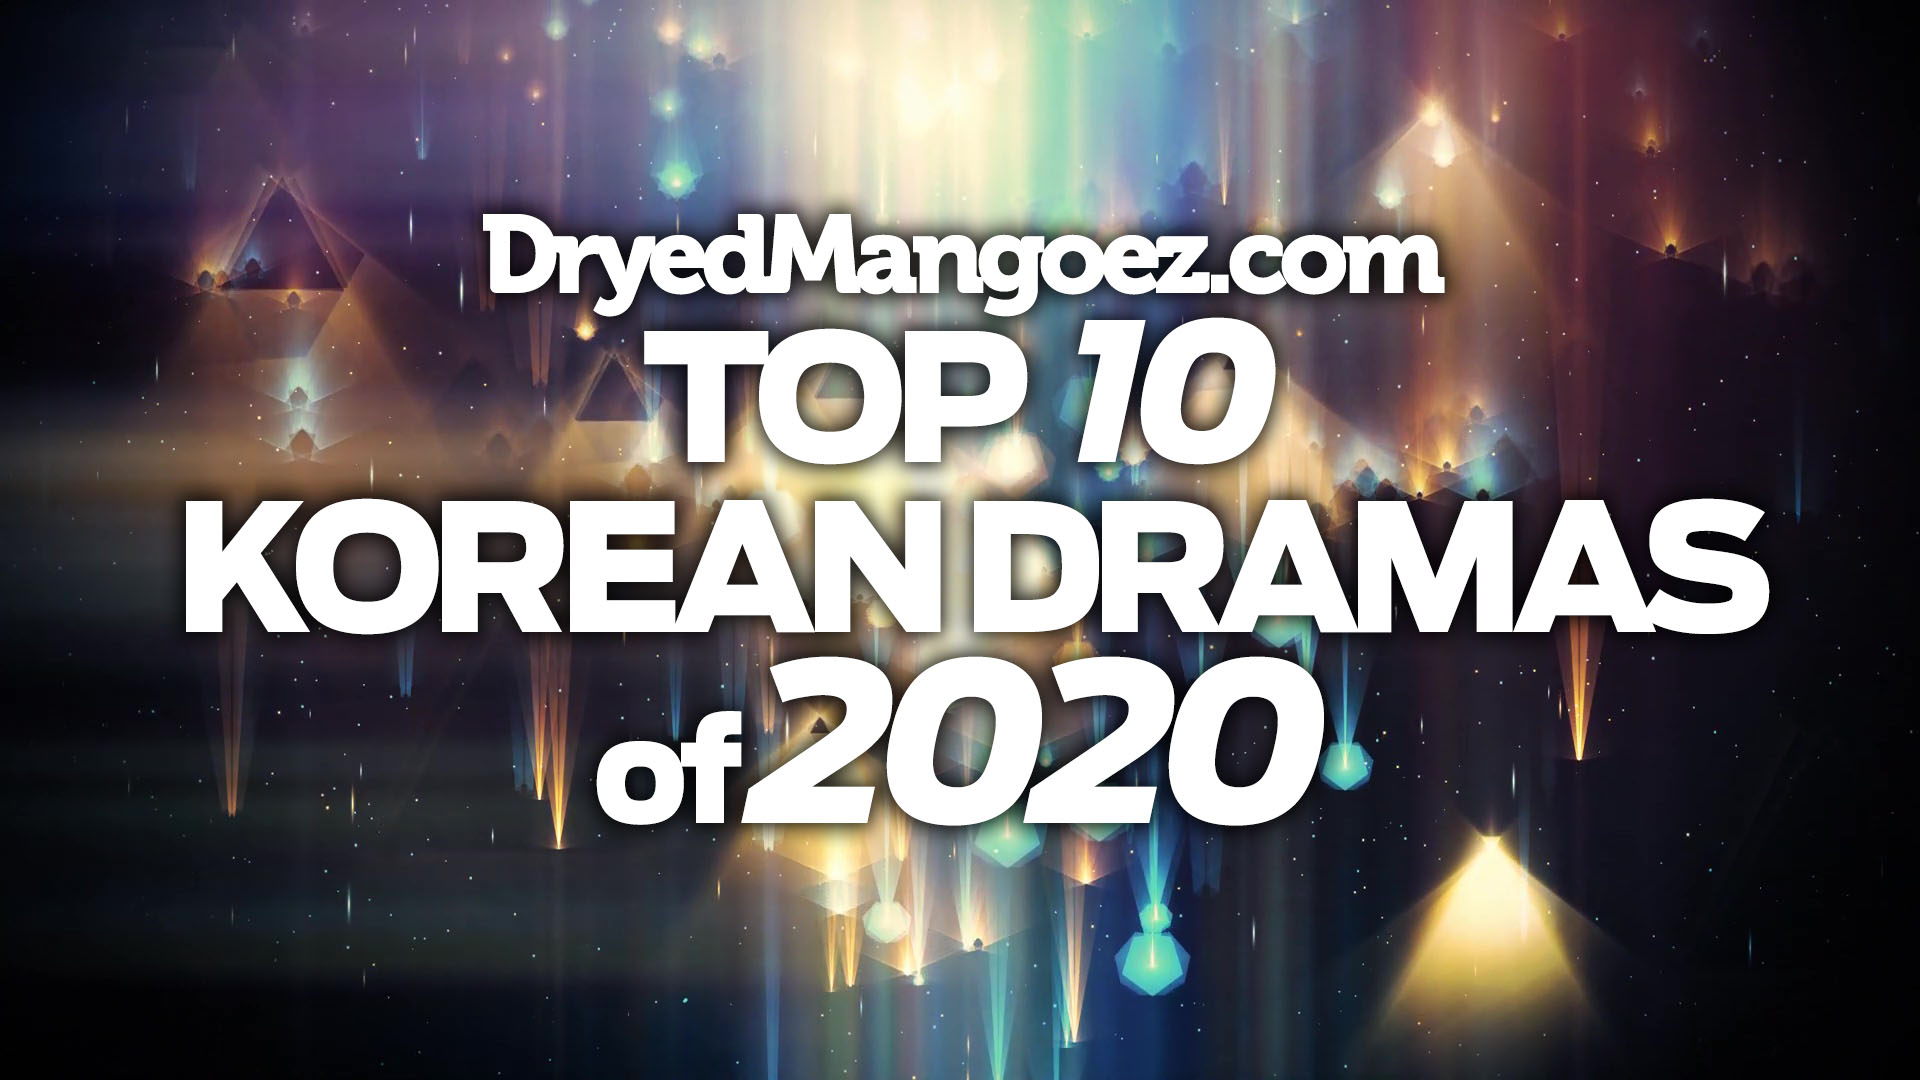 My Top 10 Korean Dramas of 2020!